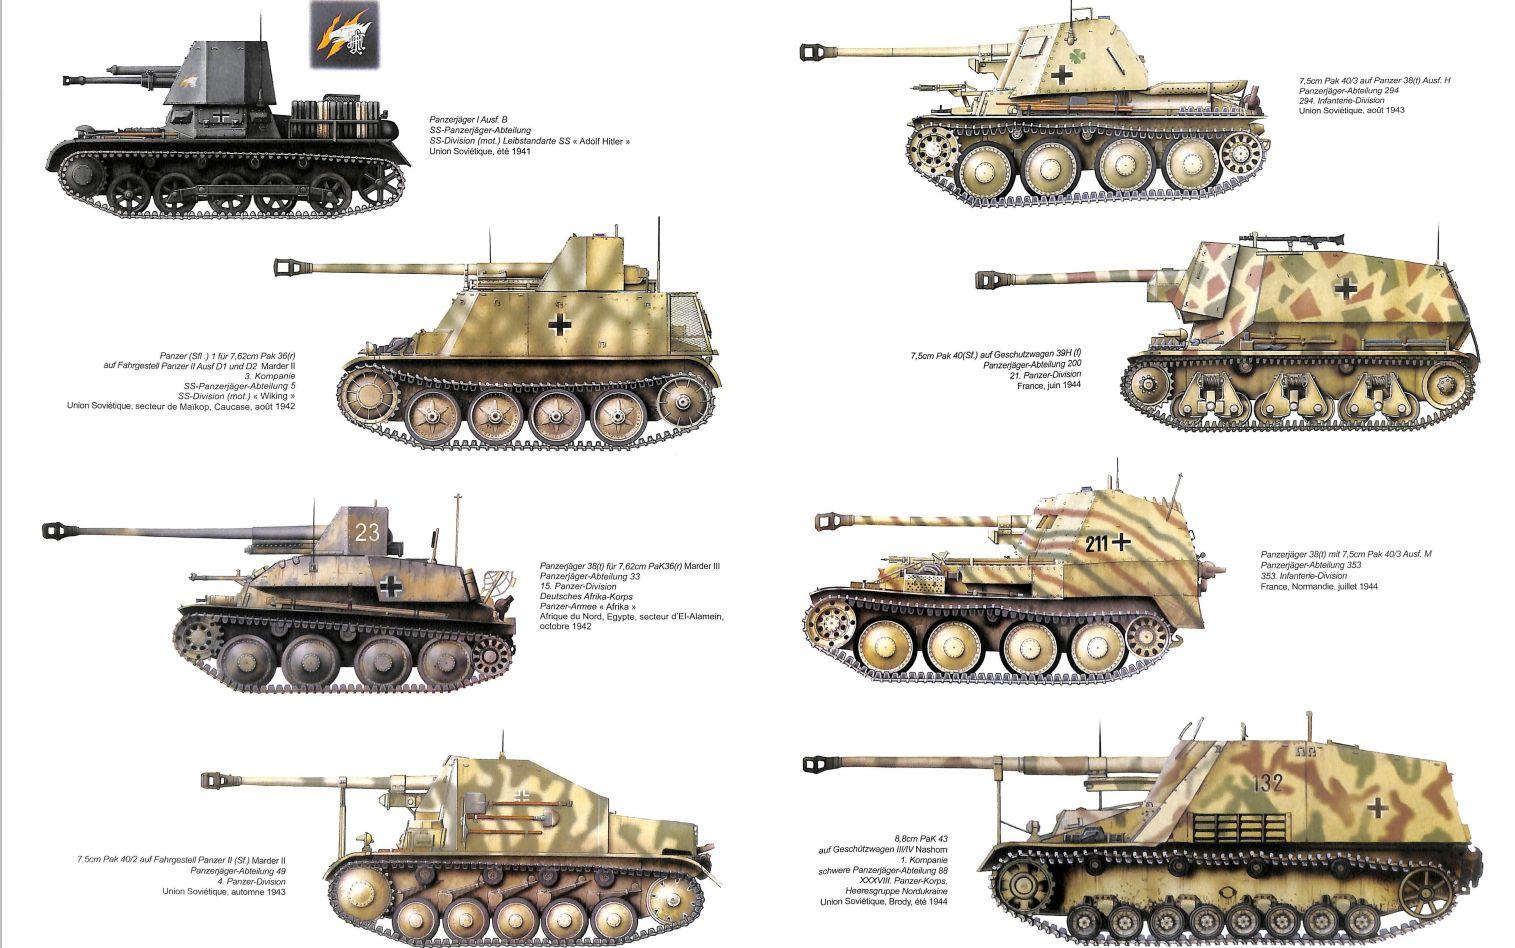 WWII German Marder II tank destroyer World War 2 WW2 Germany half track II